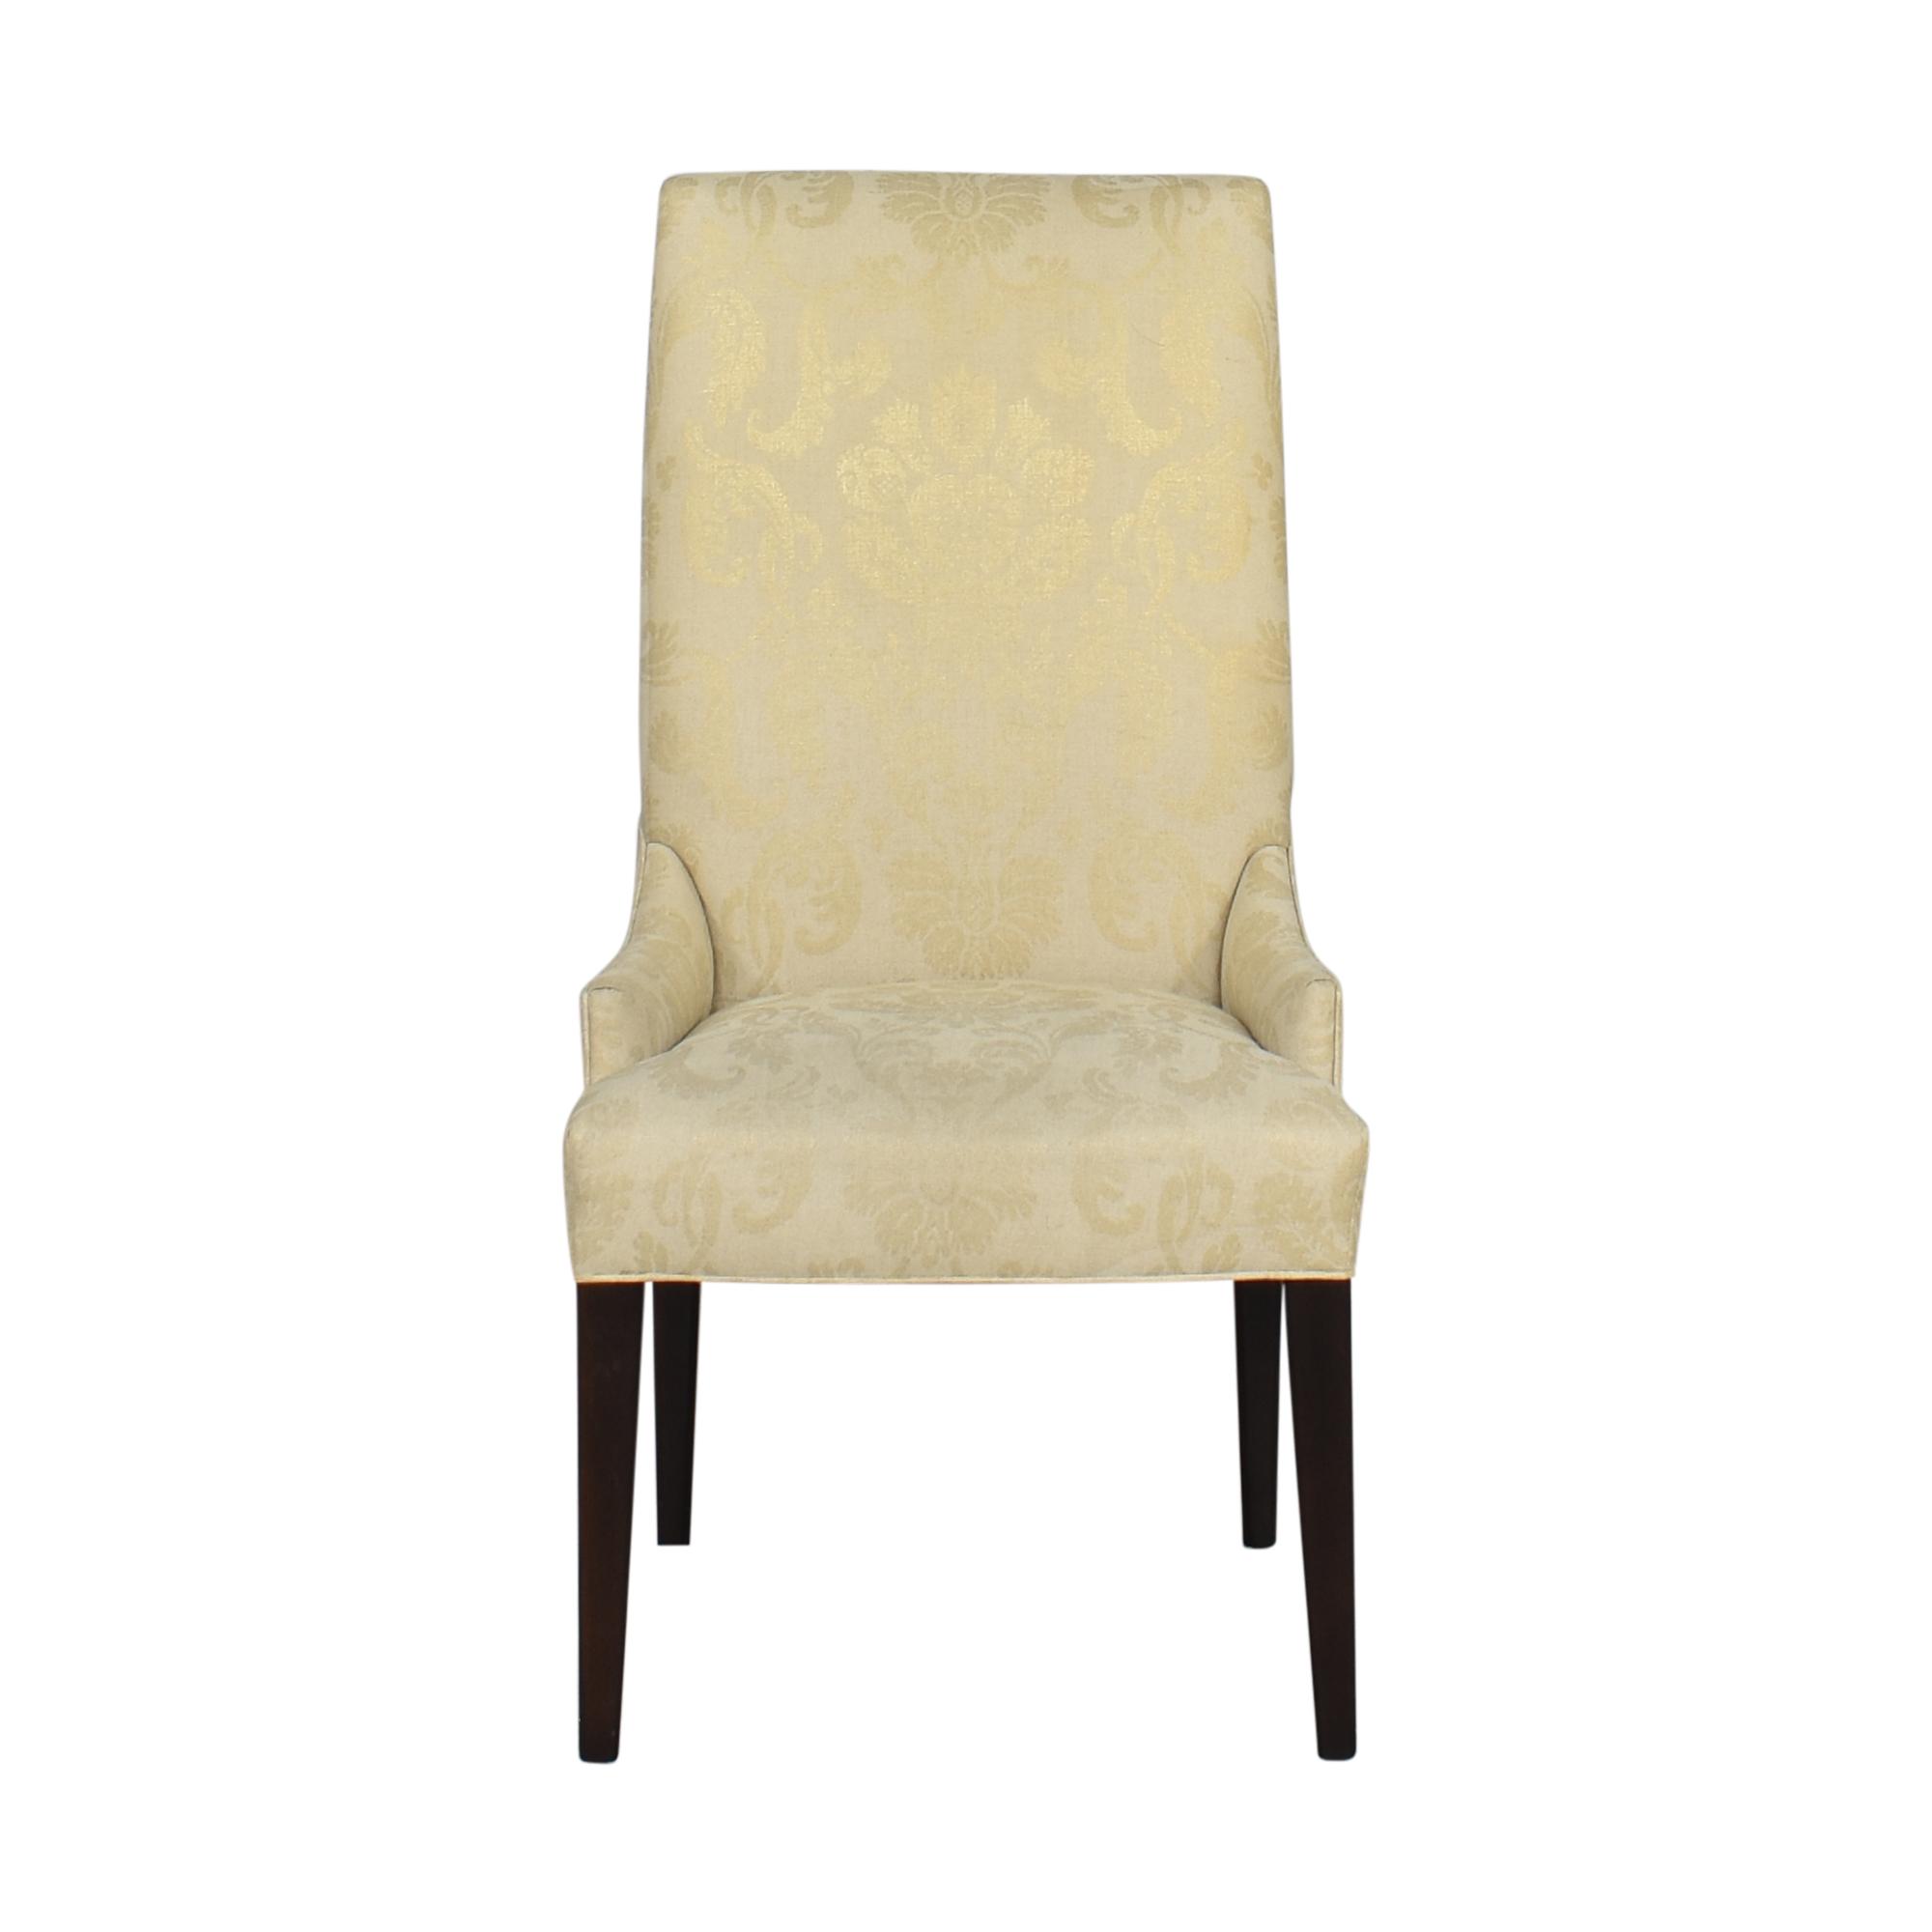 shop Arhaus Platinum High Back Dining Chair Arhaus Dining Chairs